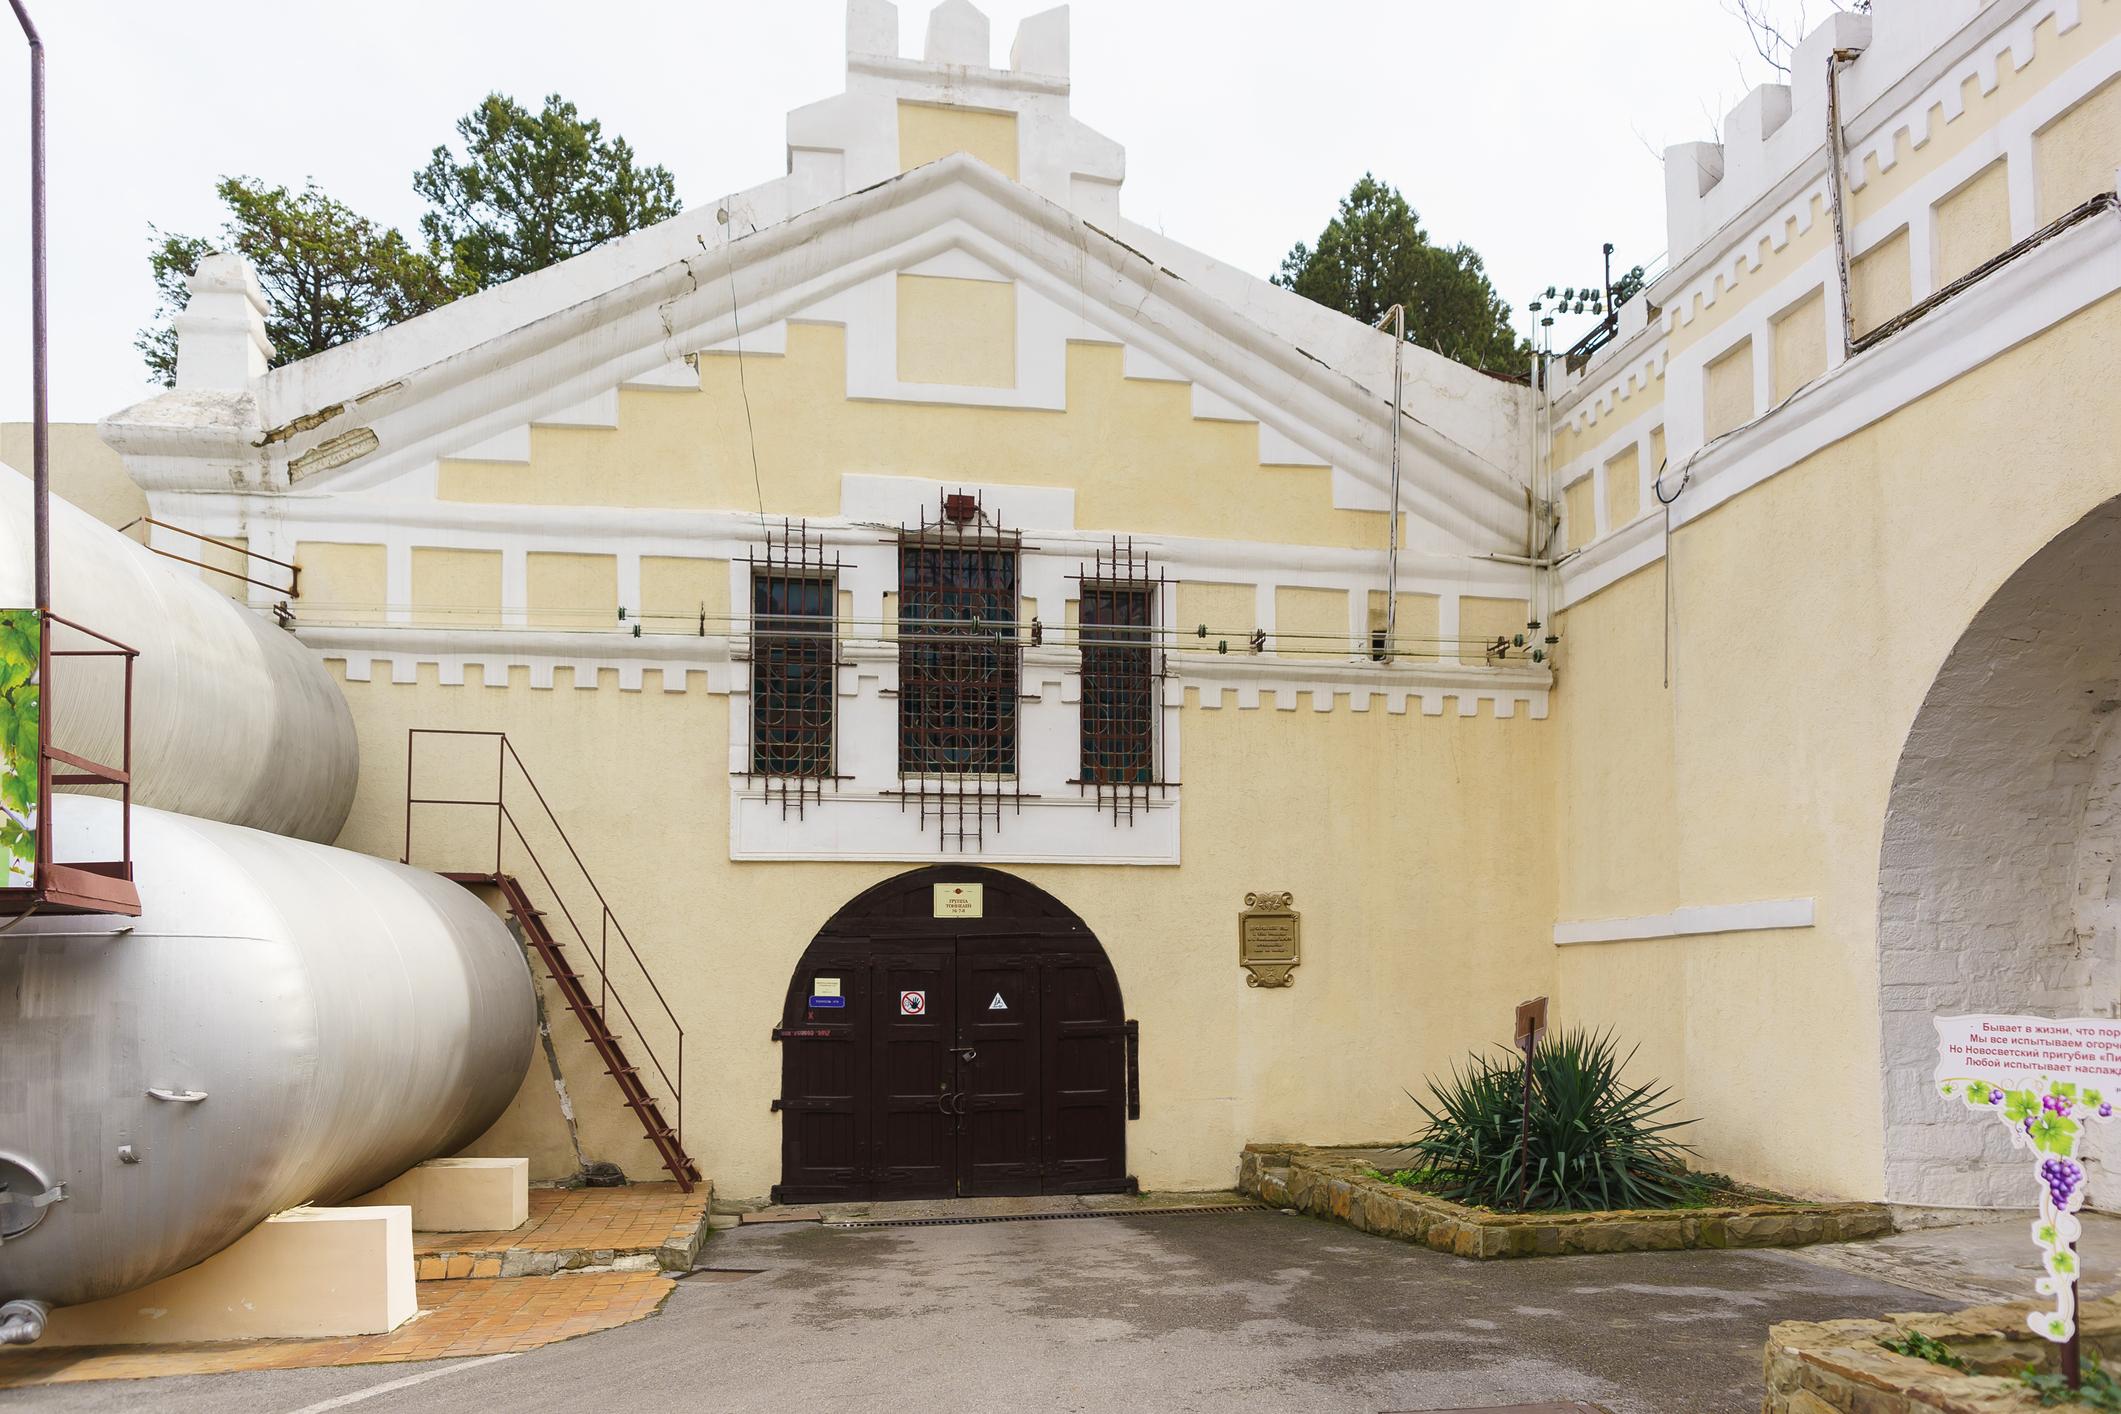 Entrance to Novy Svet Winery's cellars